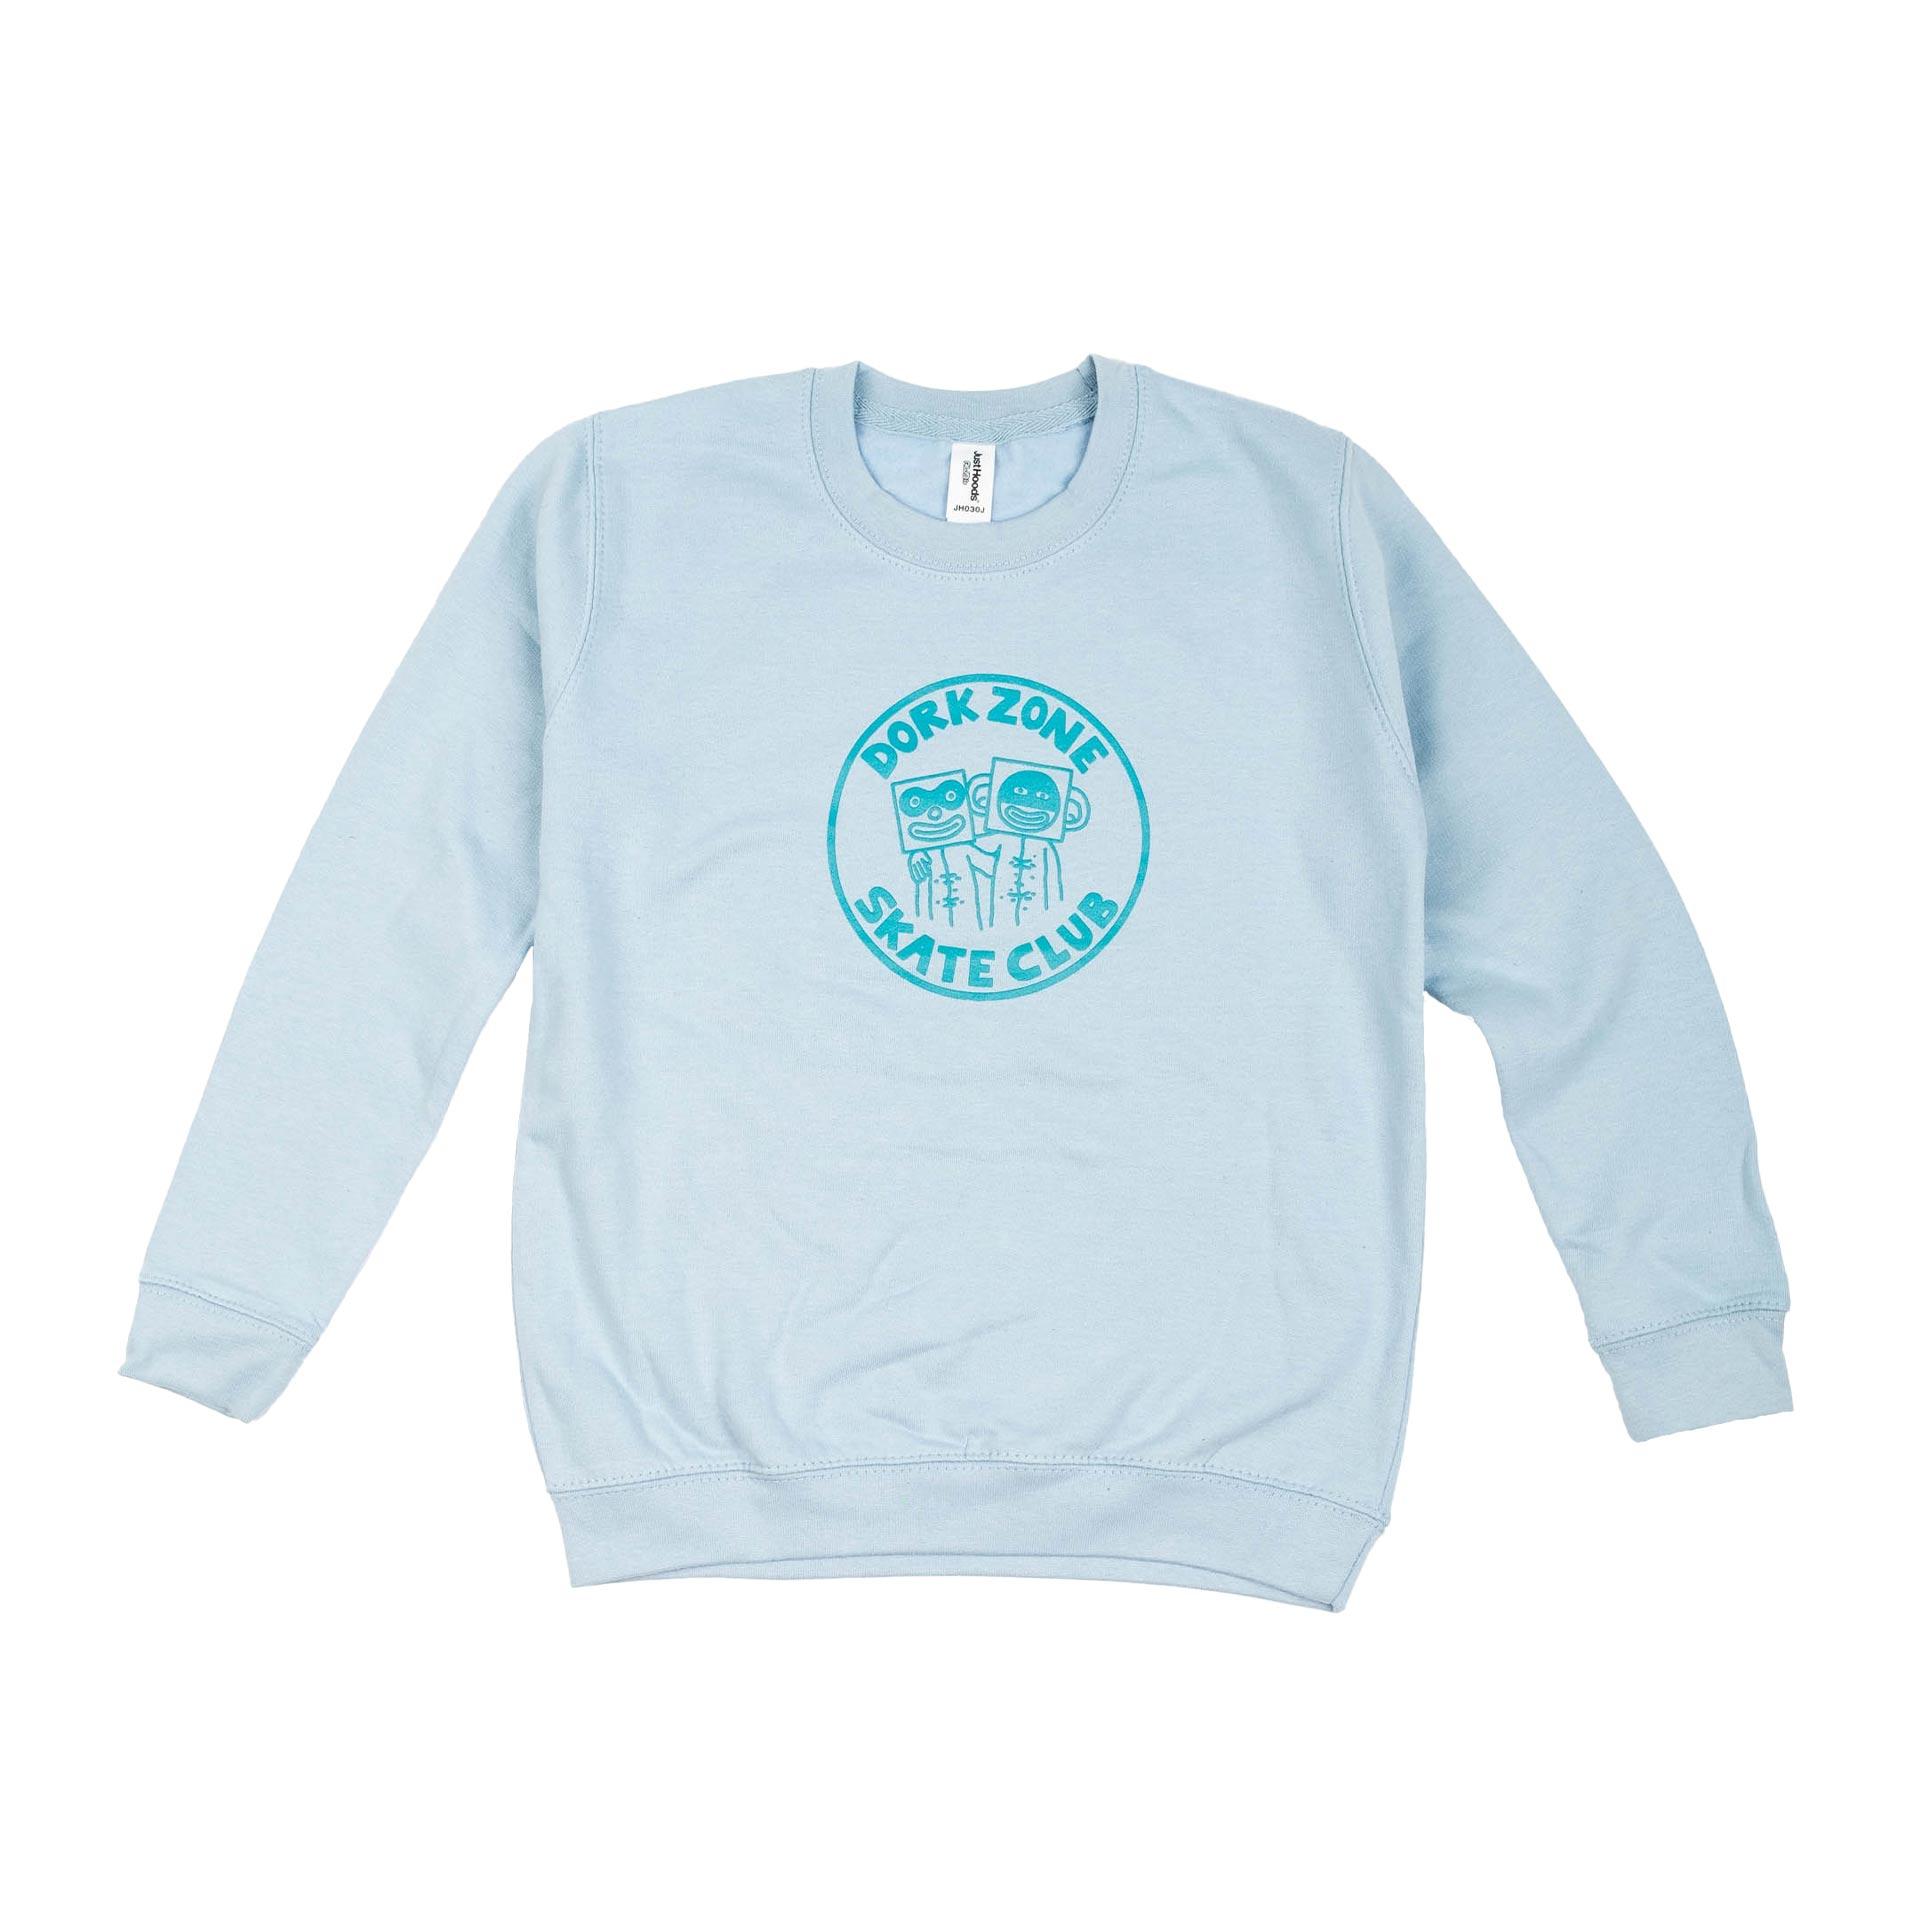 Dorkzone Skate Club Kids Sweatshirt Sky Blue